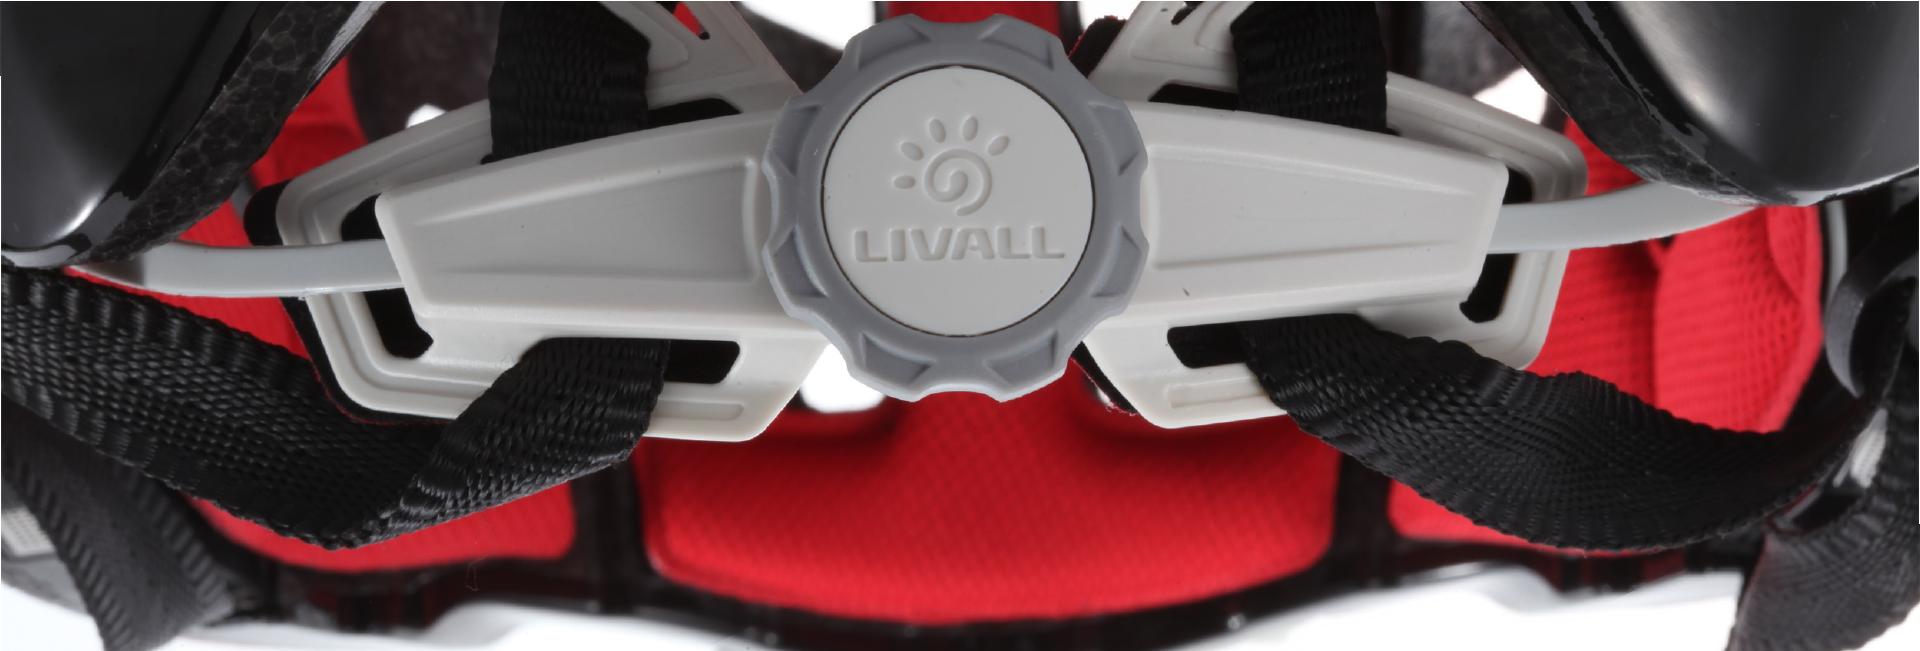 Casca smart protectie LIVALL BH60SE